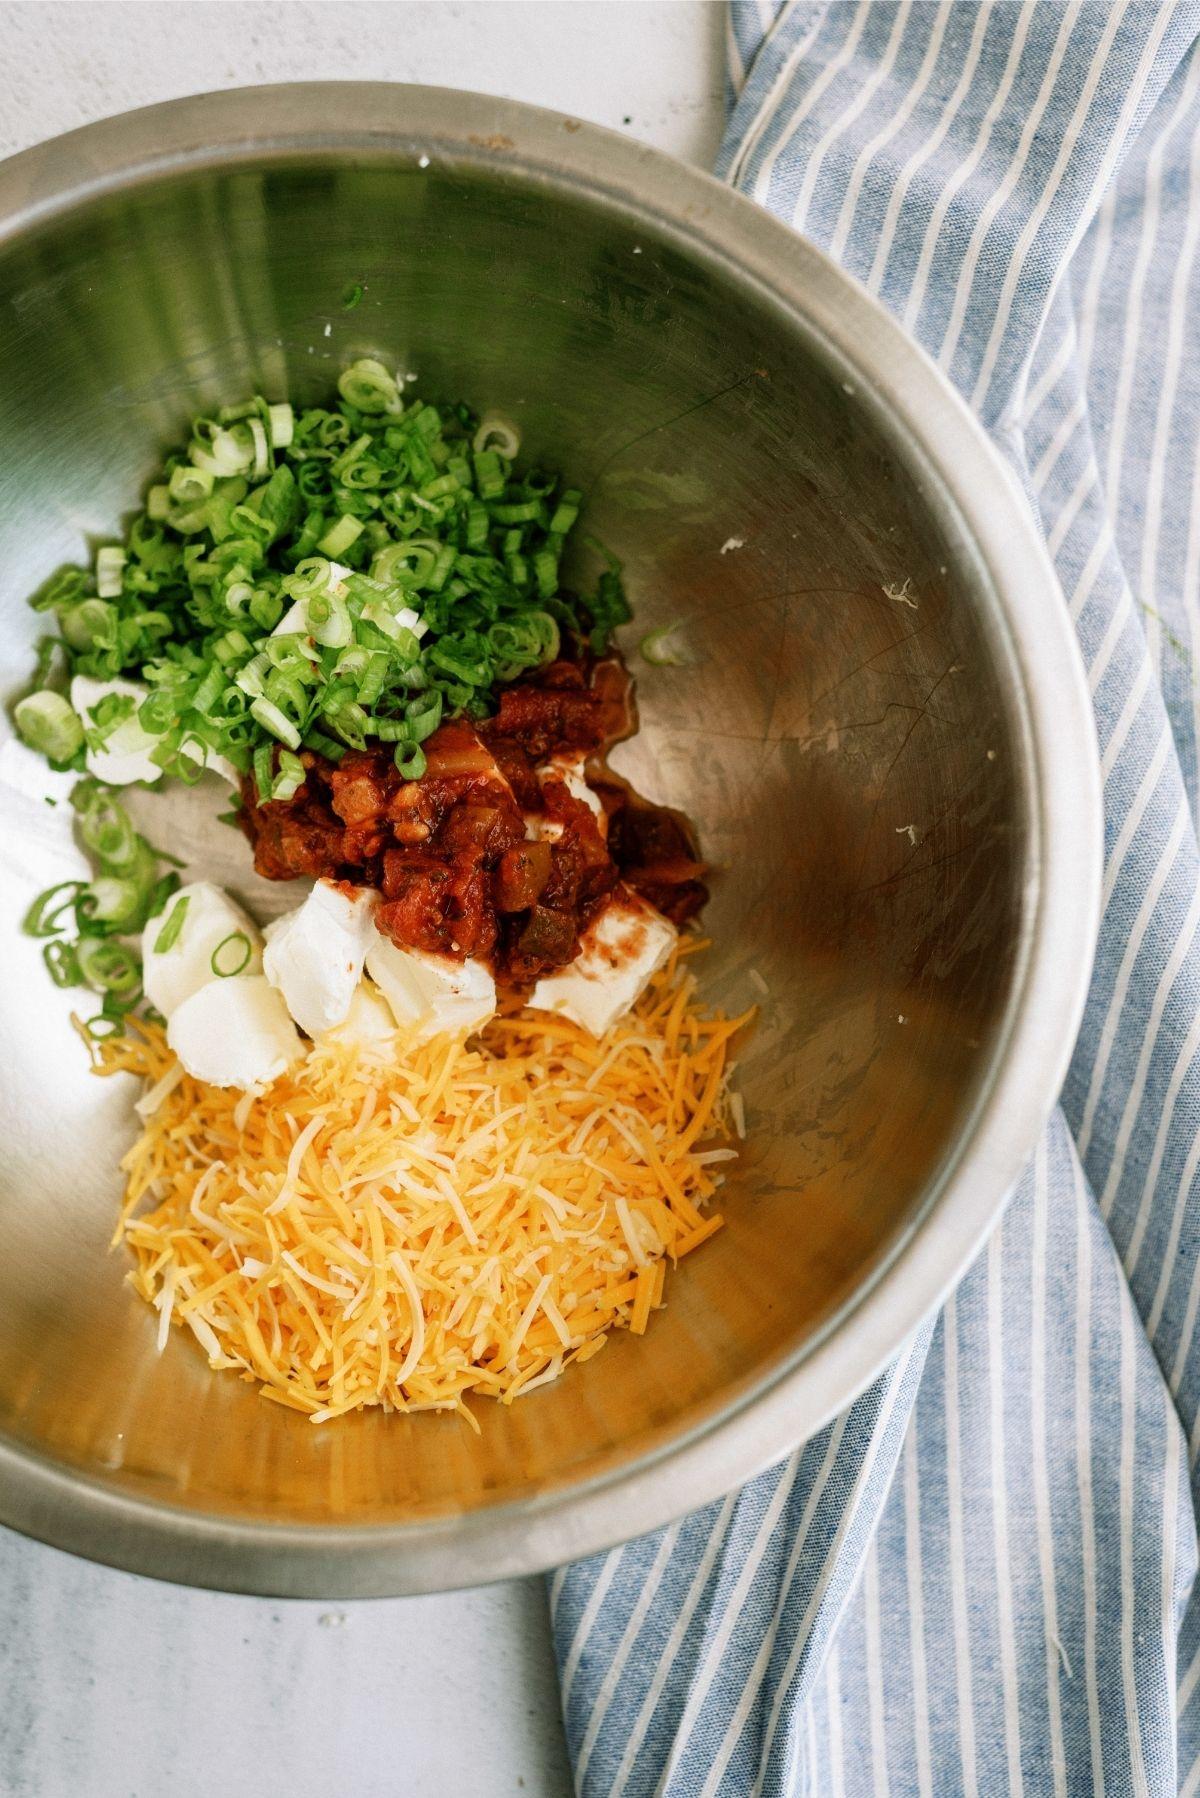 Chicken taco ingredients in metal bowl